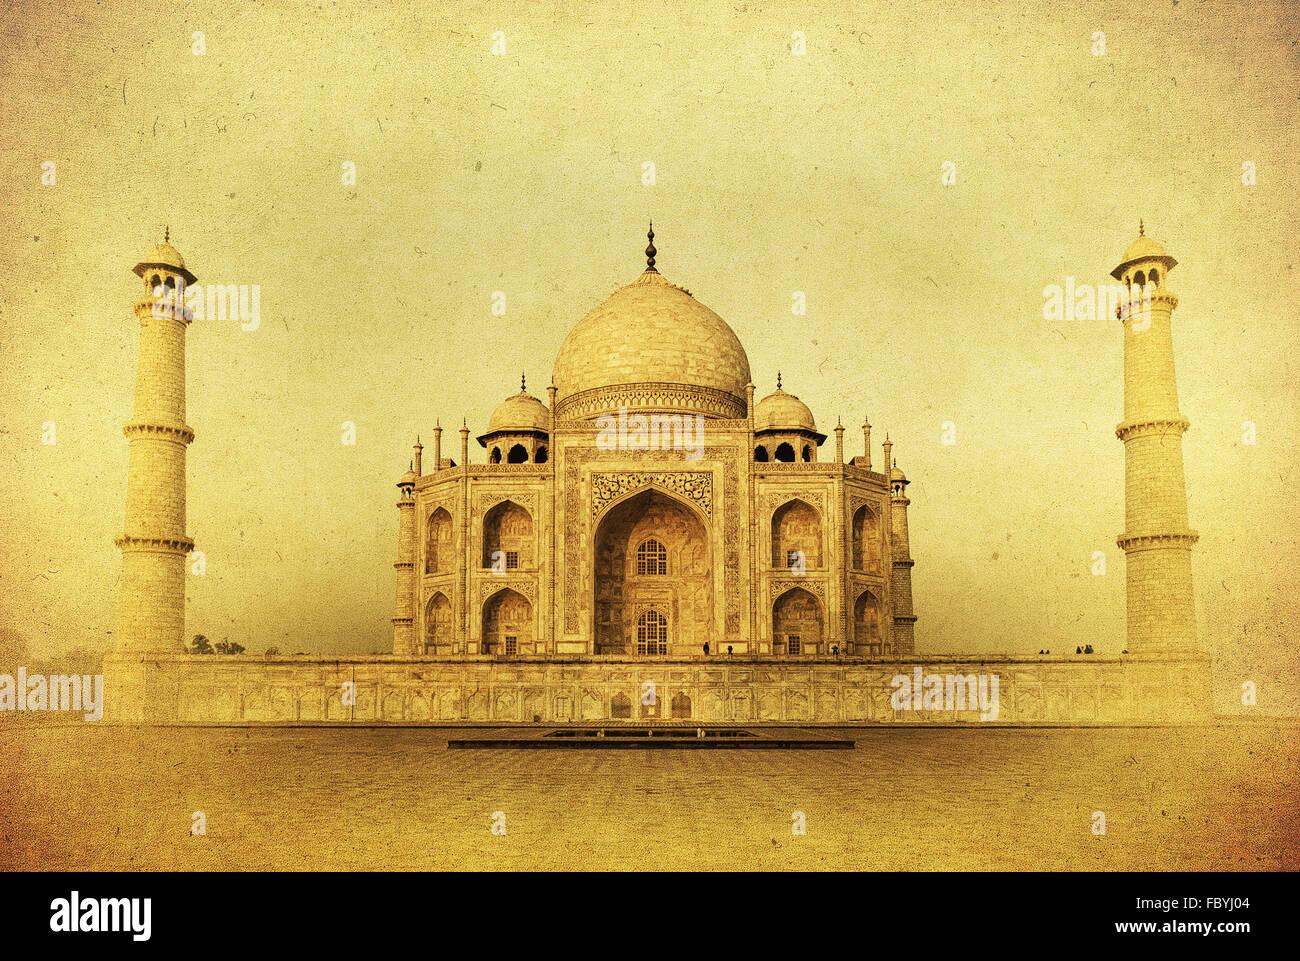 Image Vintage du Taj Mahal au lever du soleil, Agra, Inde Photo Stock